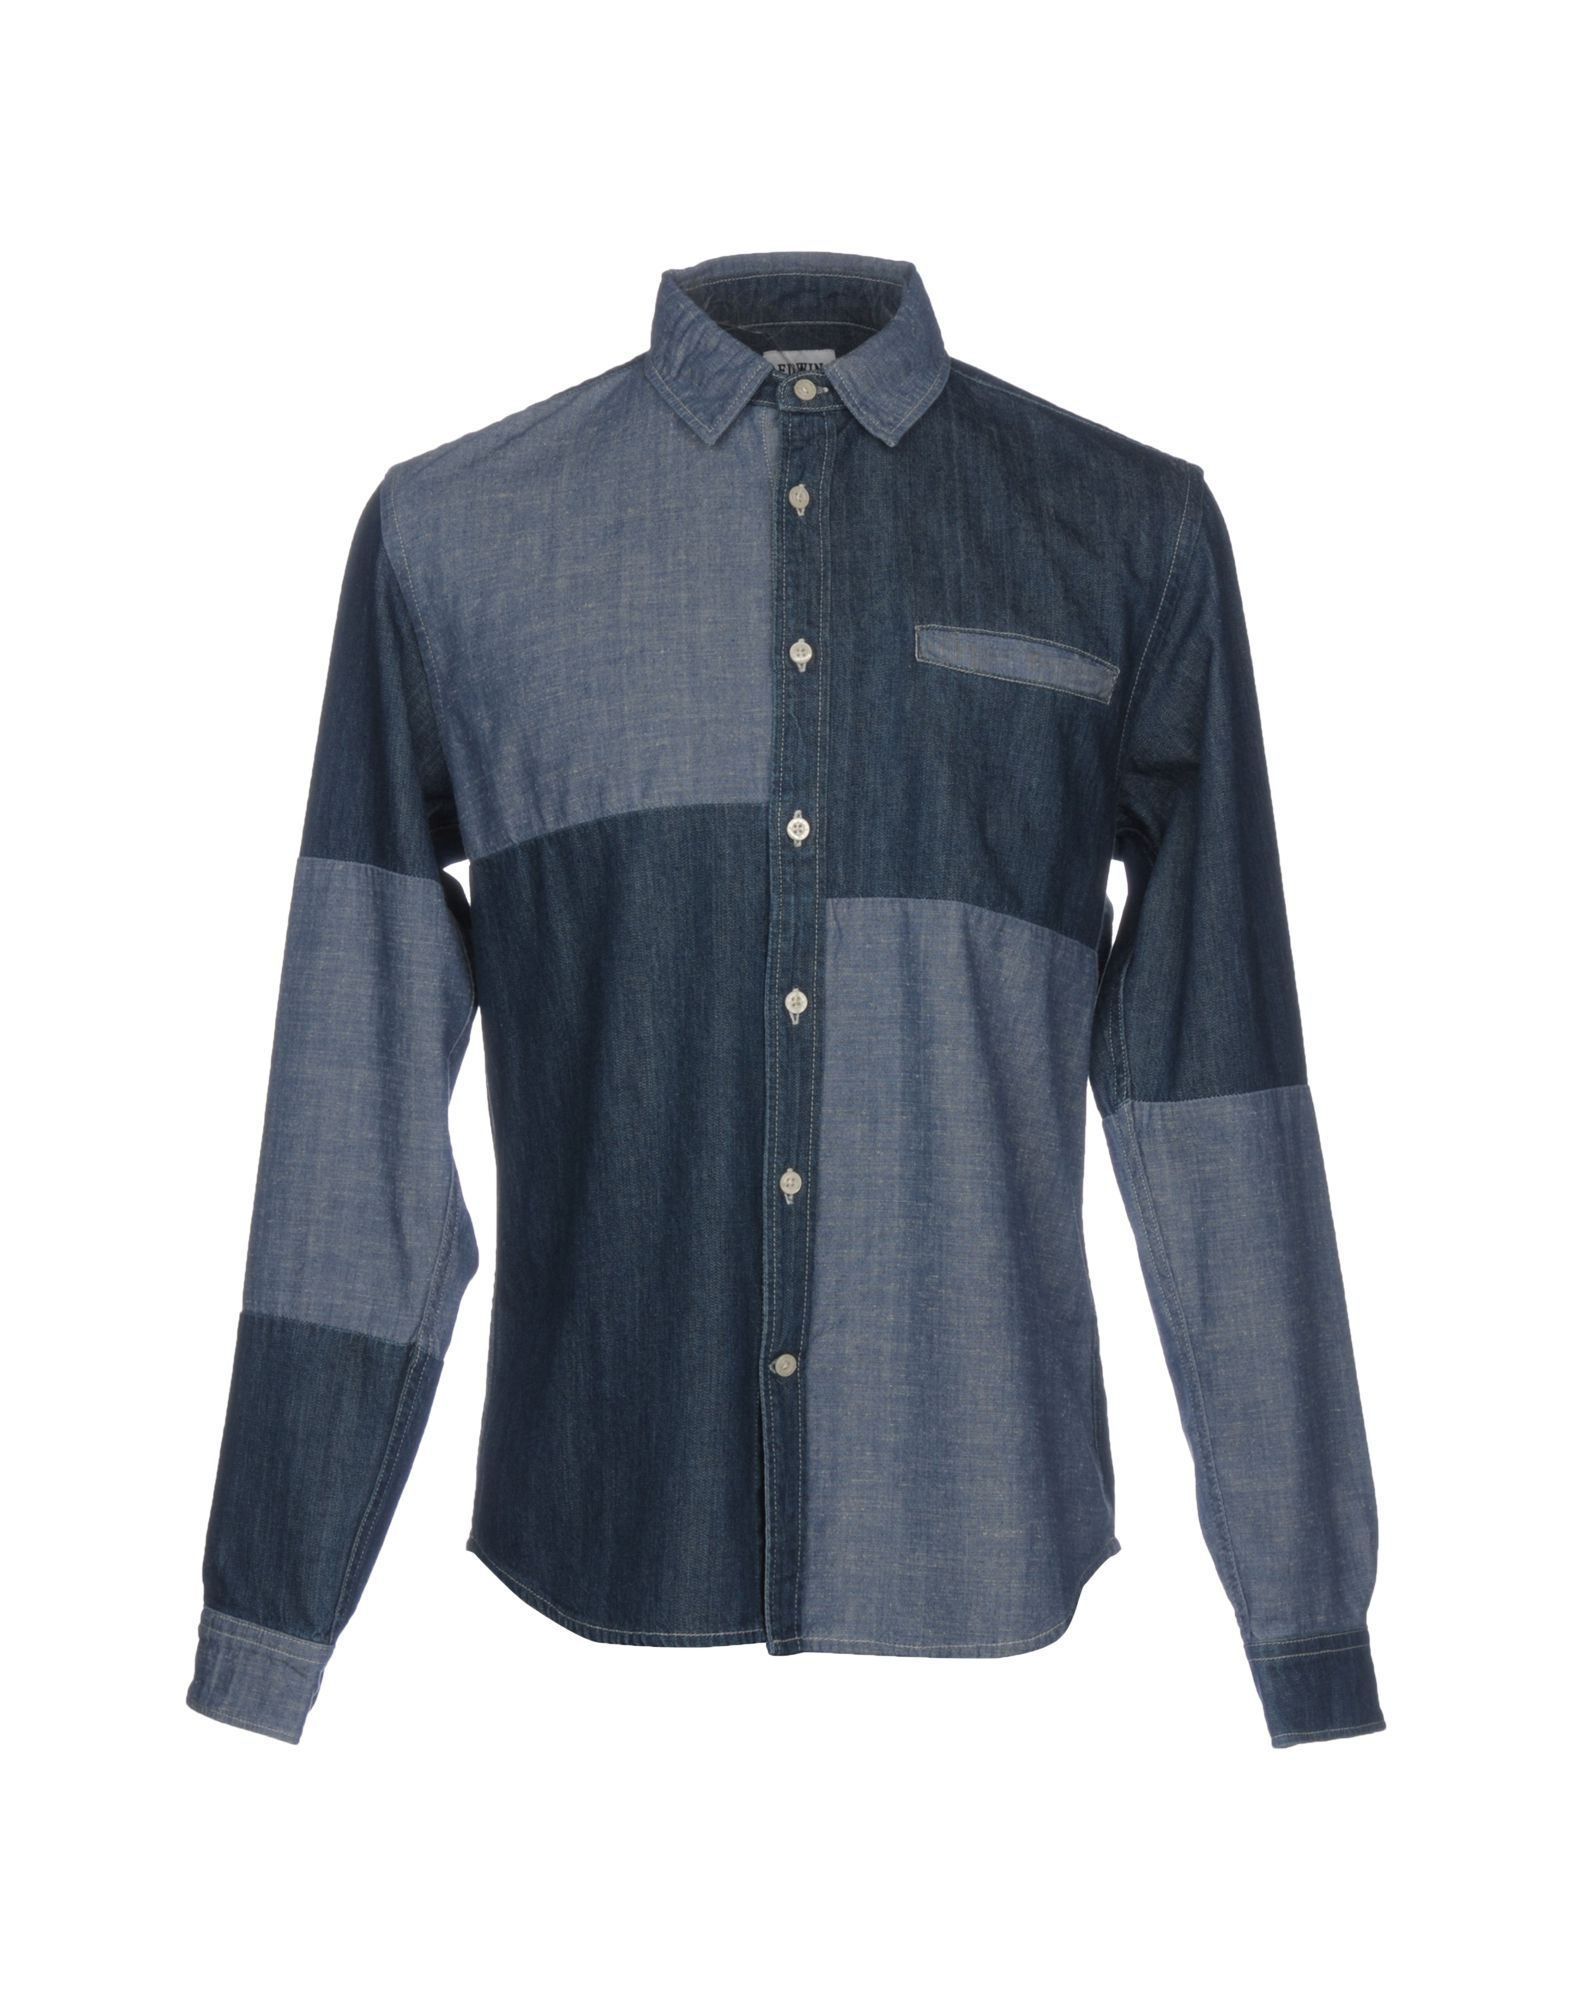 EDWIN Джинсовая рубашка theory джинсовая рубашка